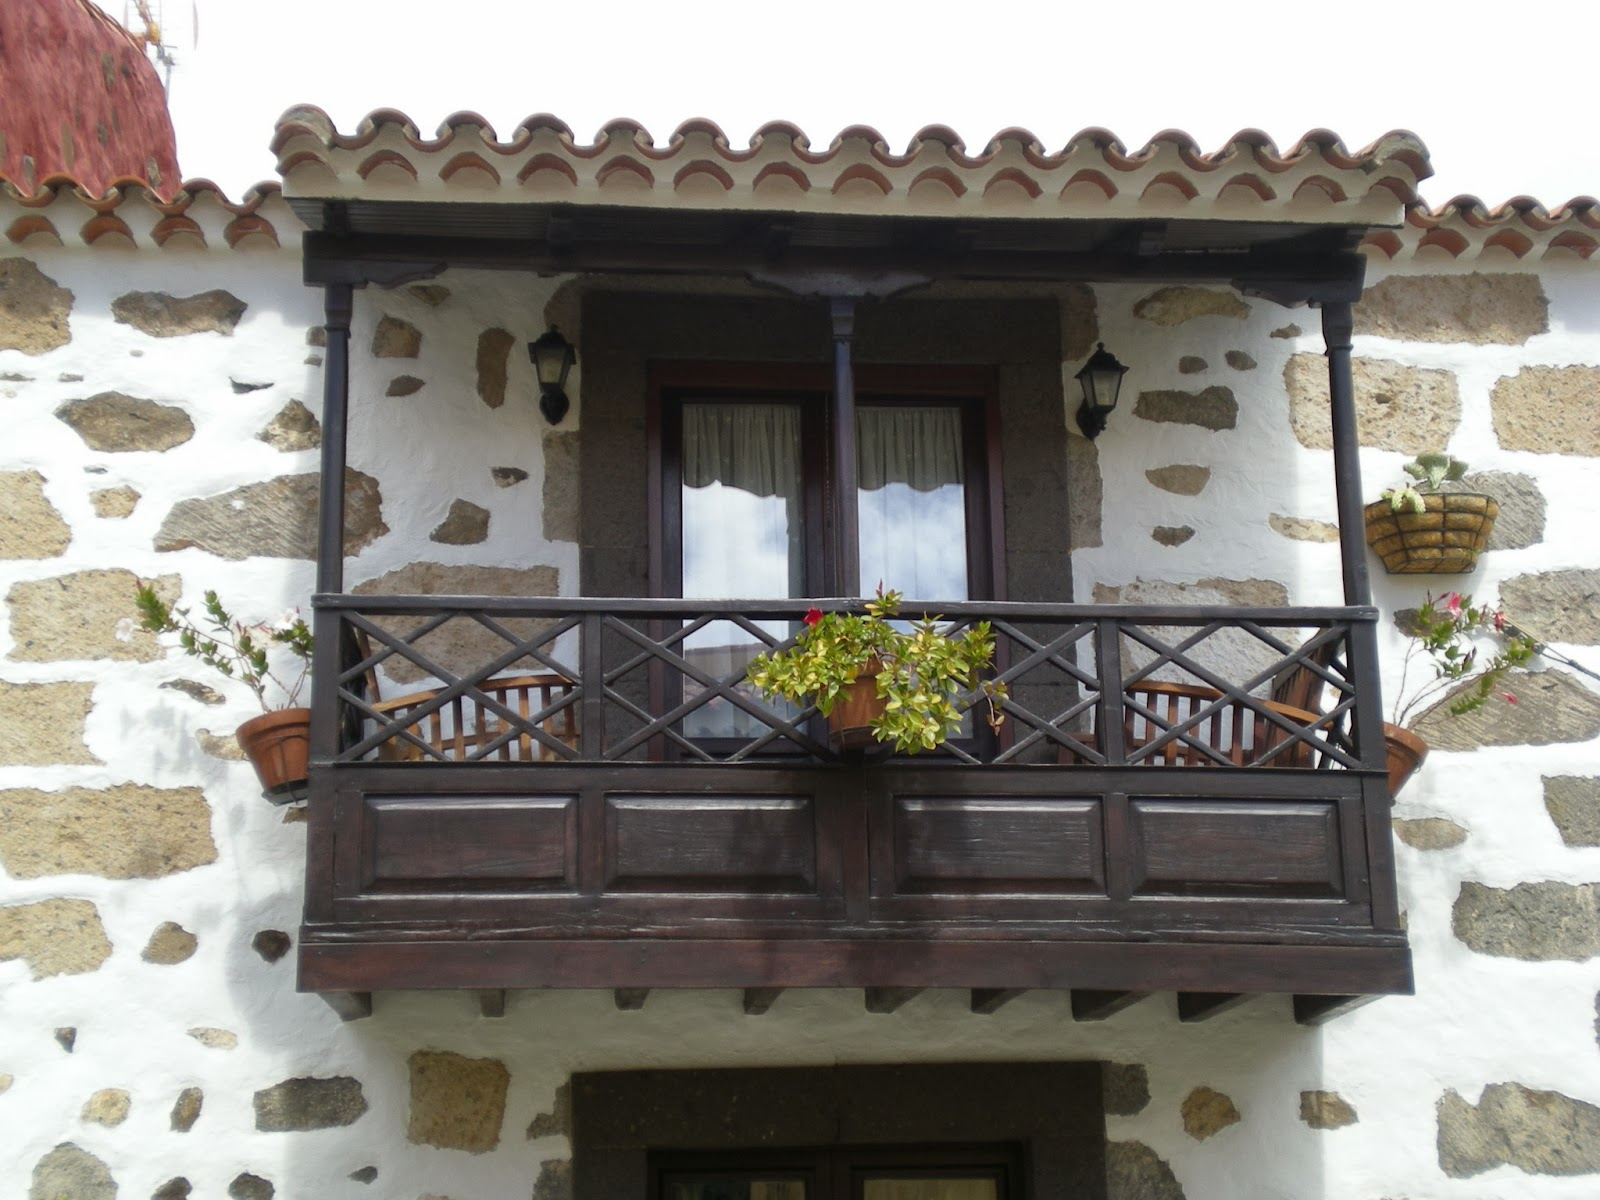 Crear m s verde balcones ajardinados for Cocina urbana canaria